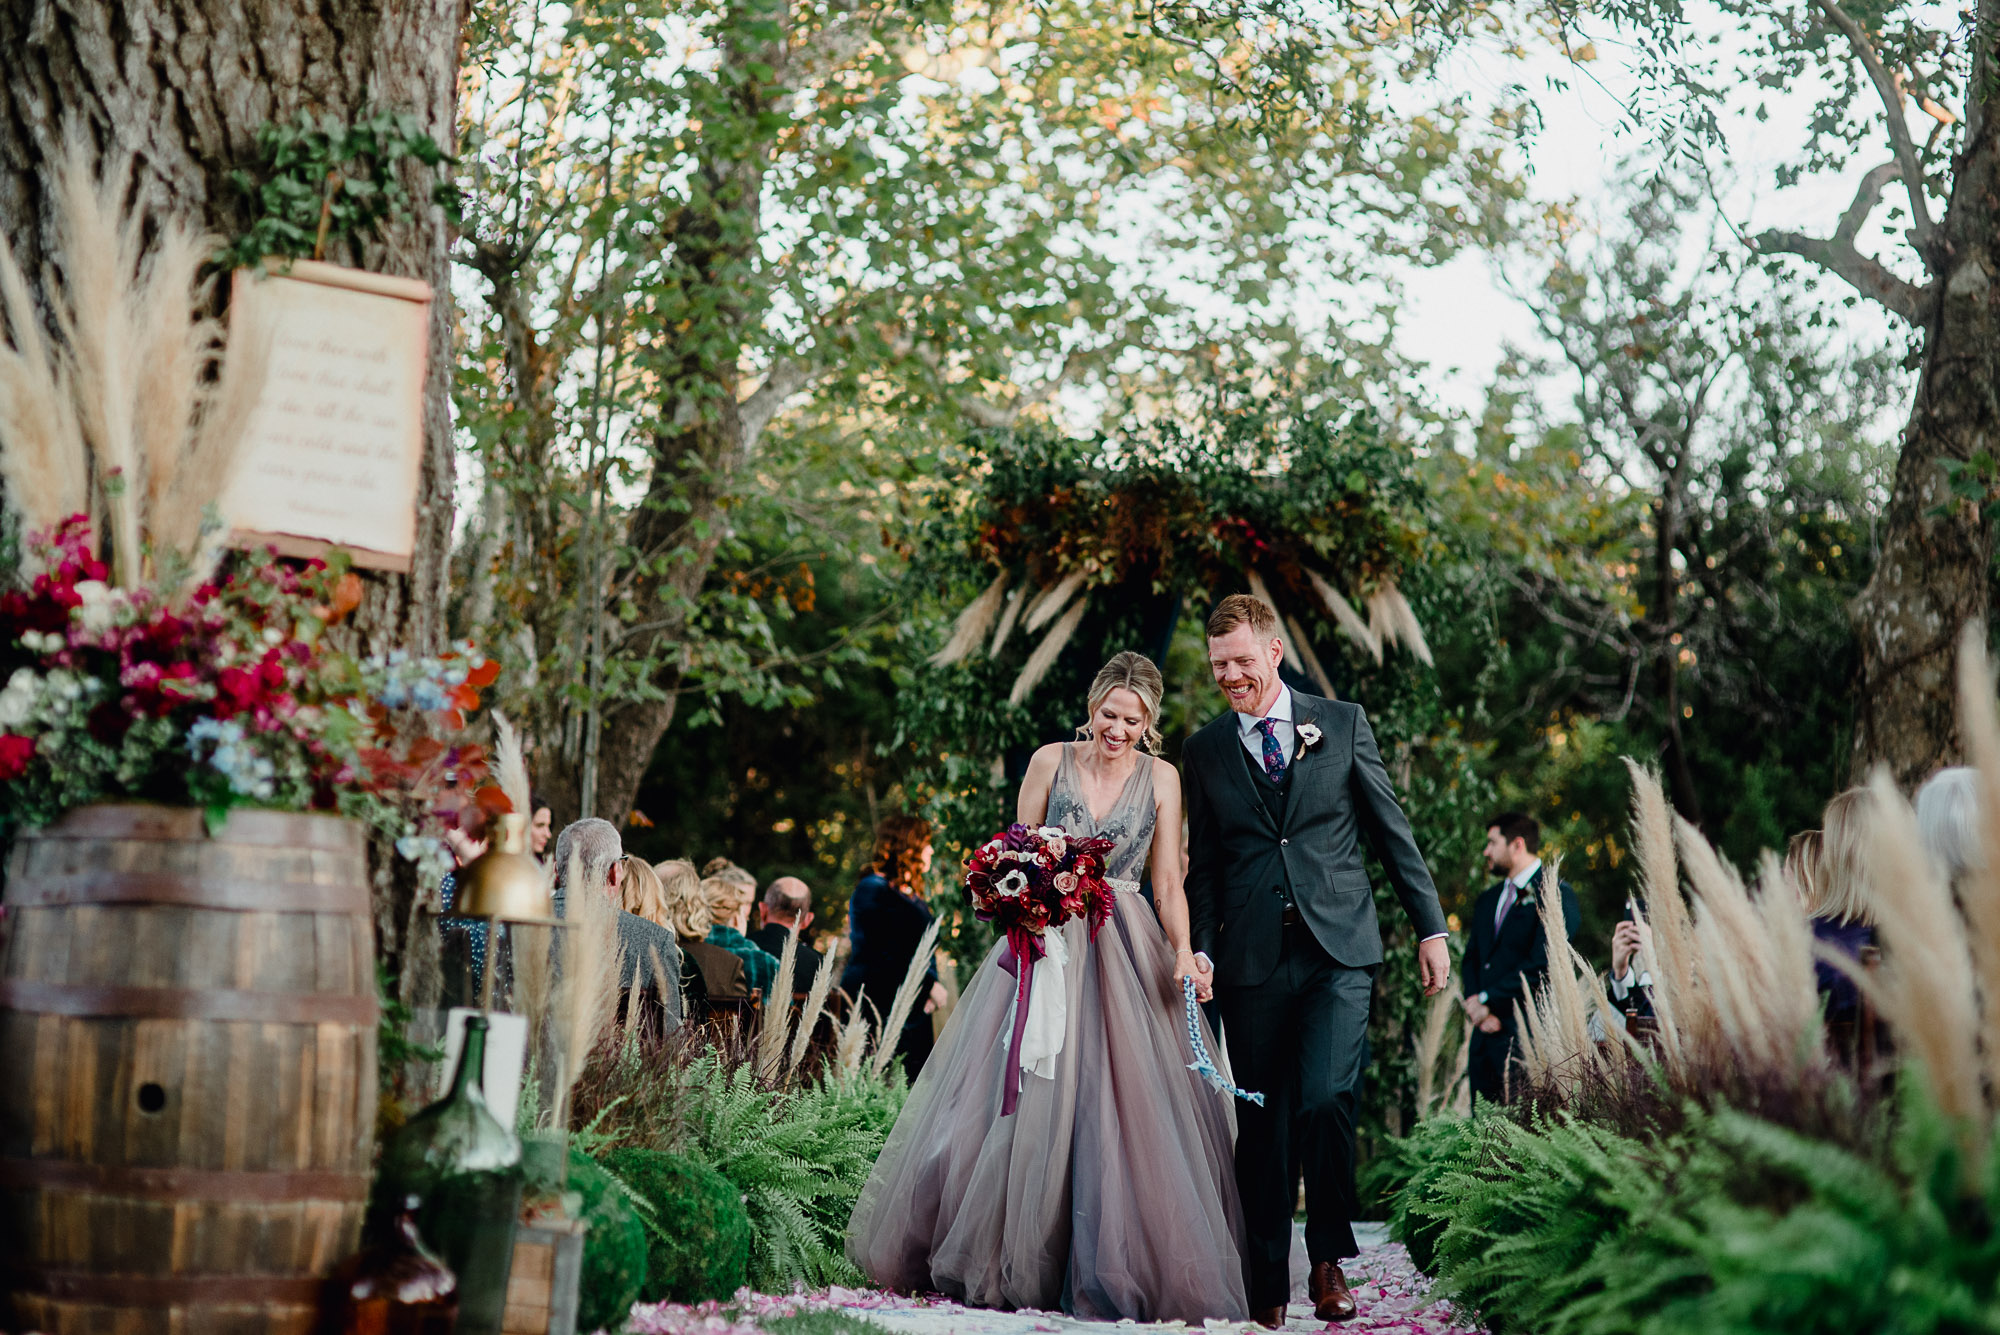 pecan springs ranch wedding photography, pecan springs ranch weddings, dripping springs wedding photographer